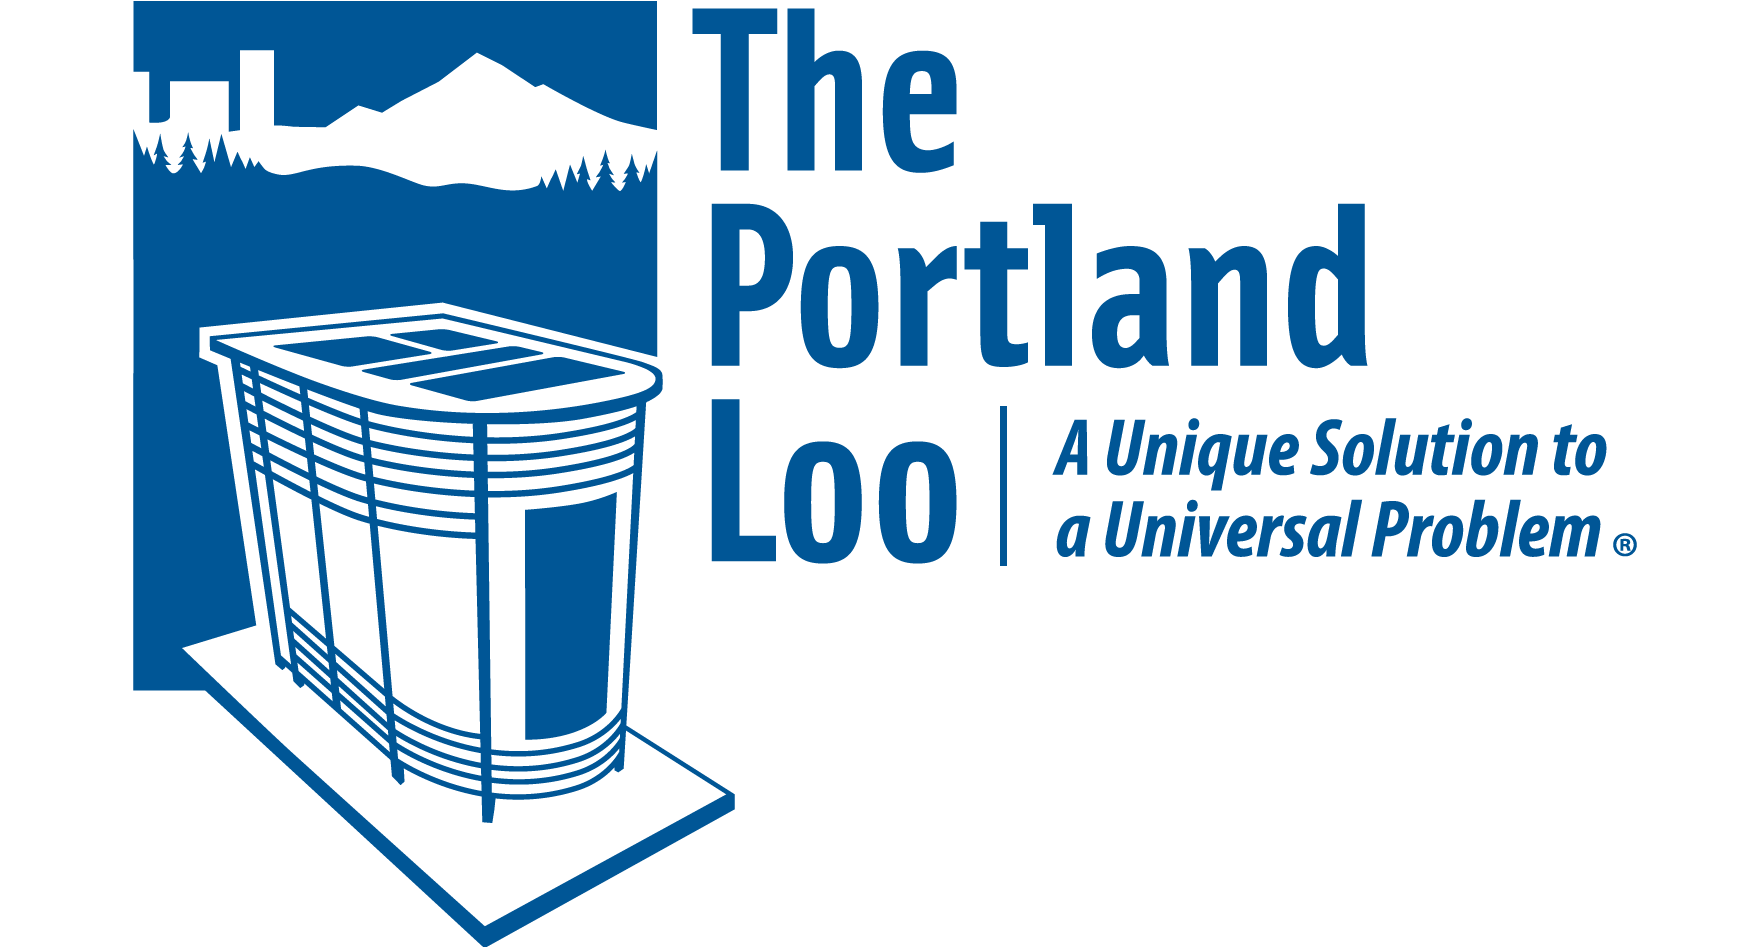 The Portland Loo